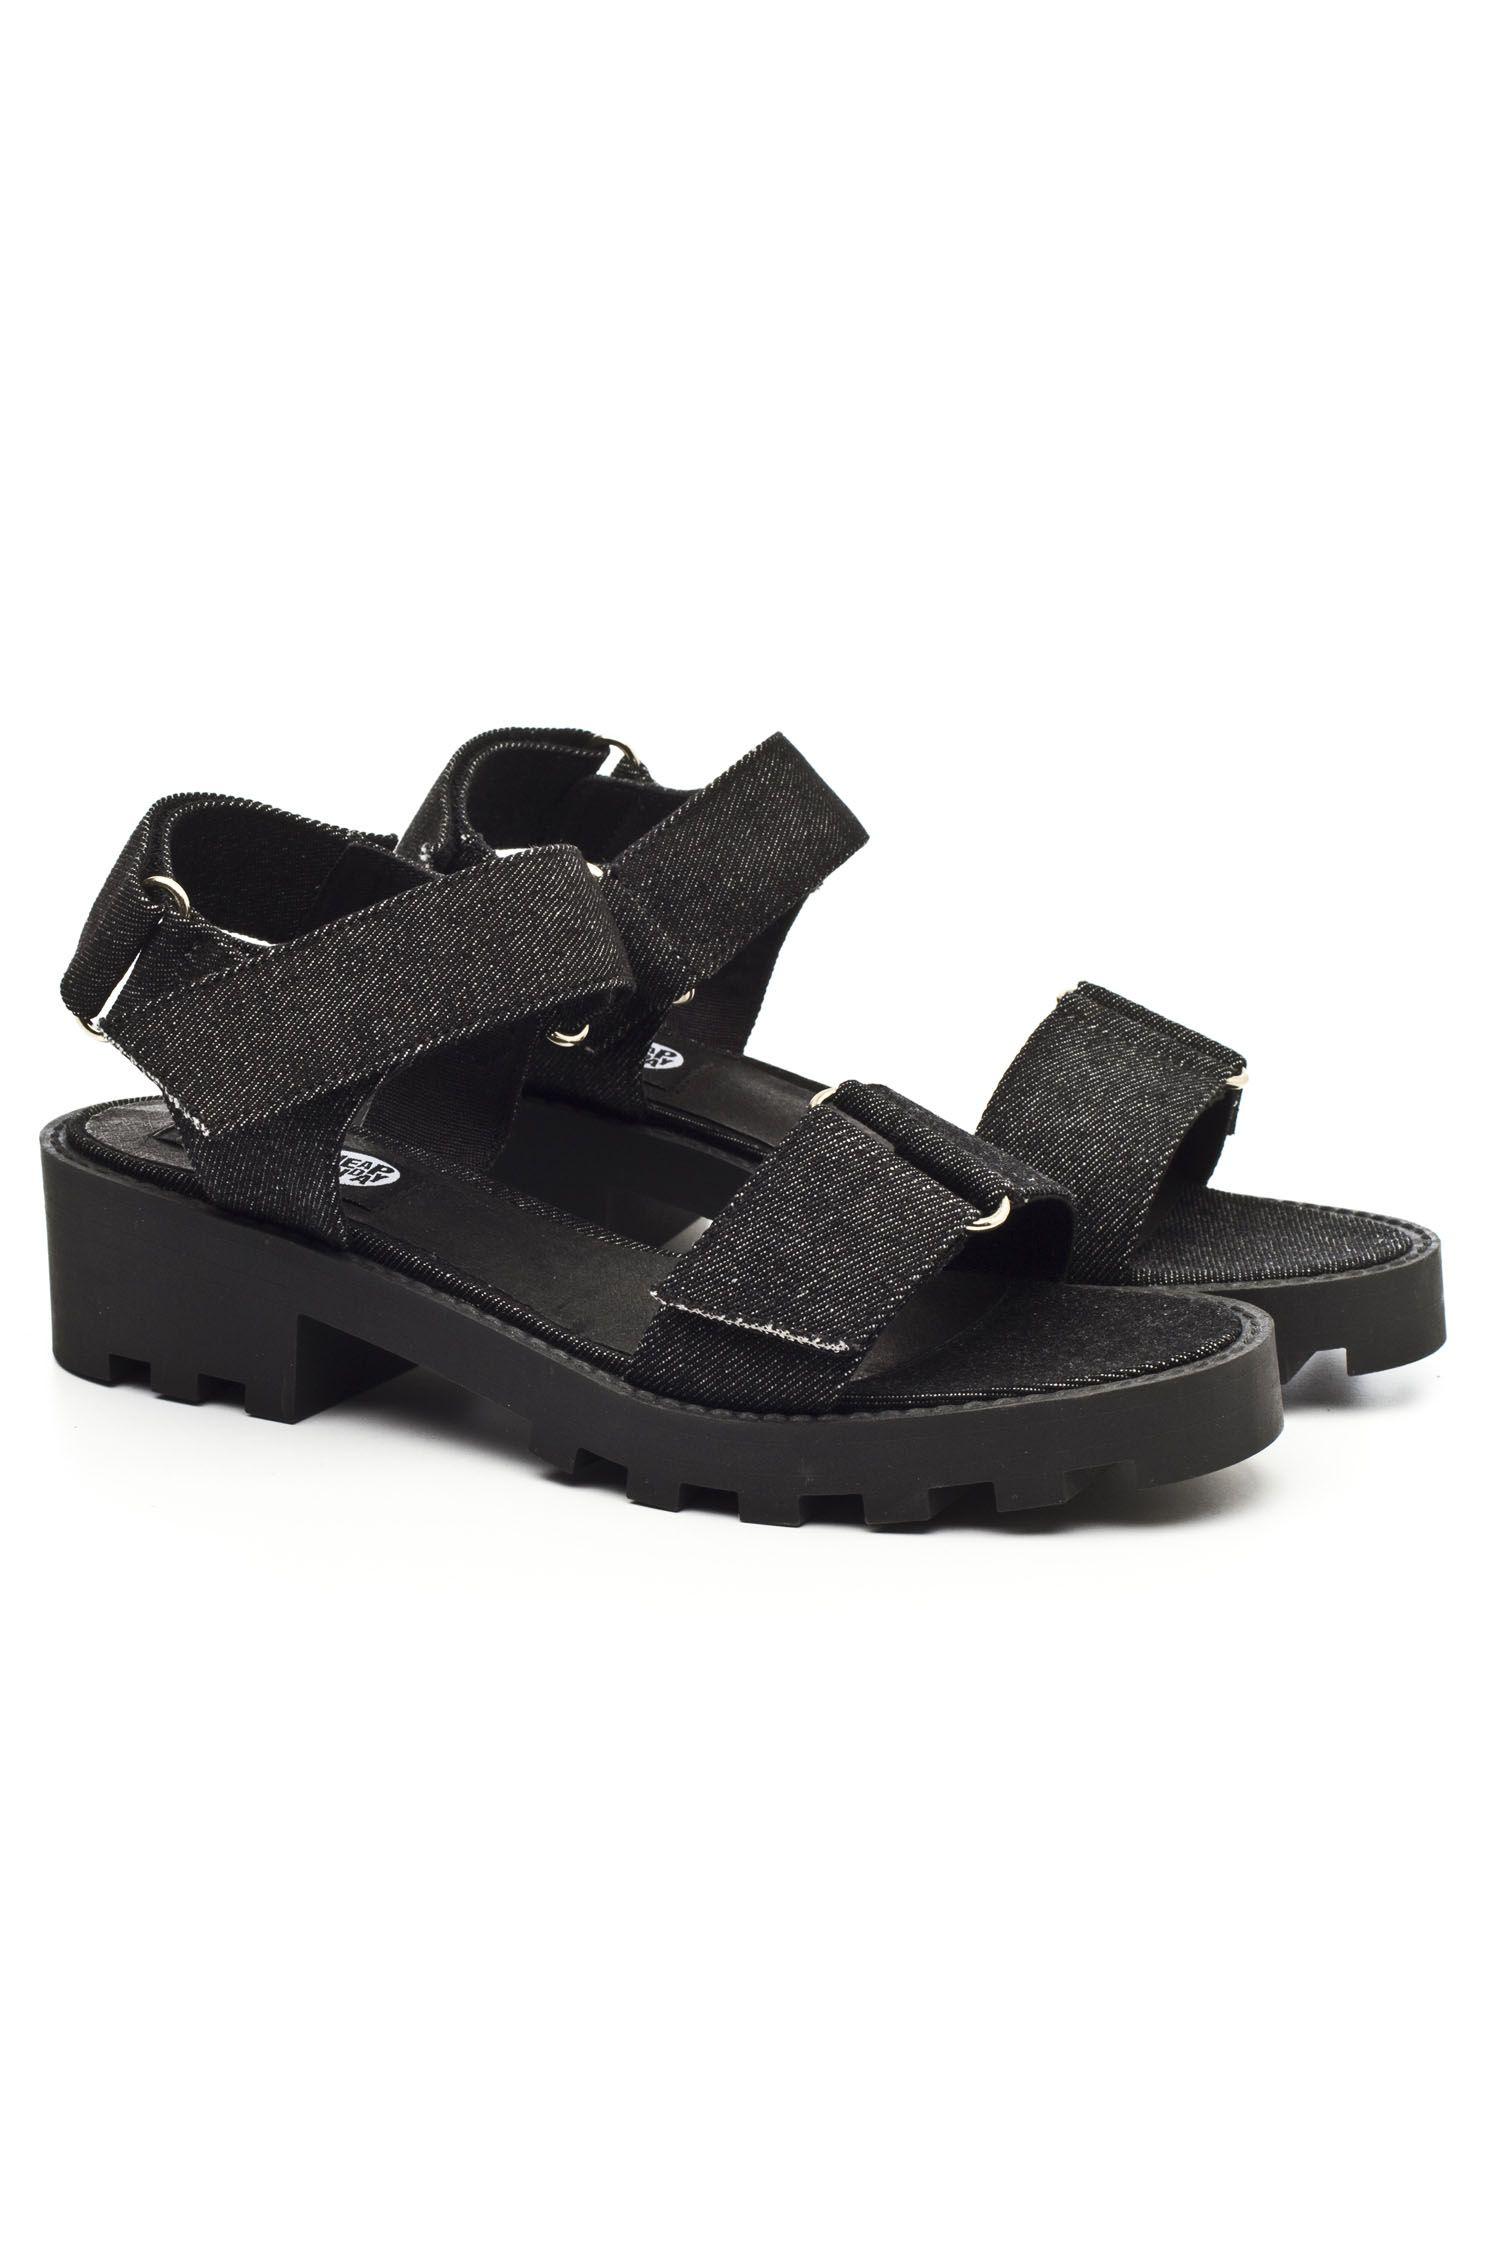 FOOTWEAR - Sandals Cheap Monday o2W6iD149